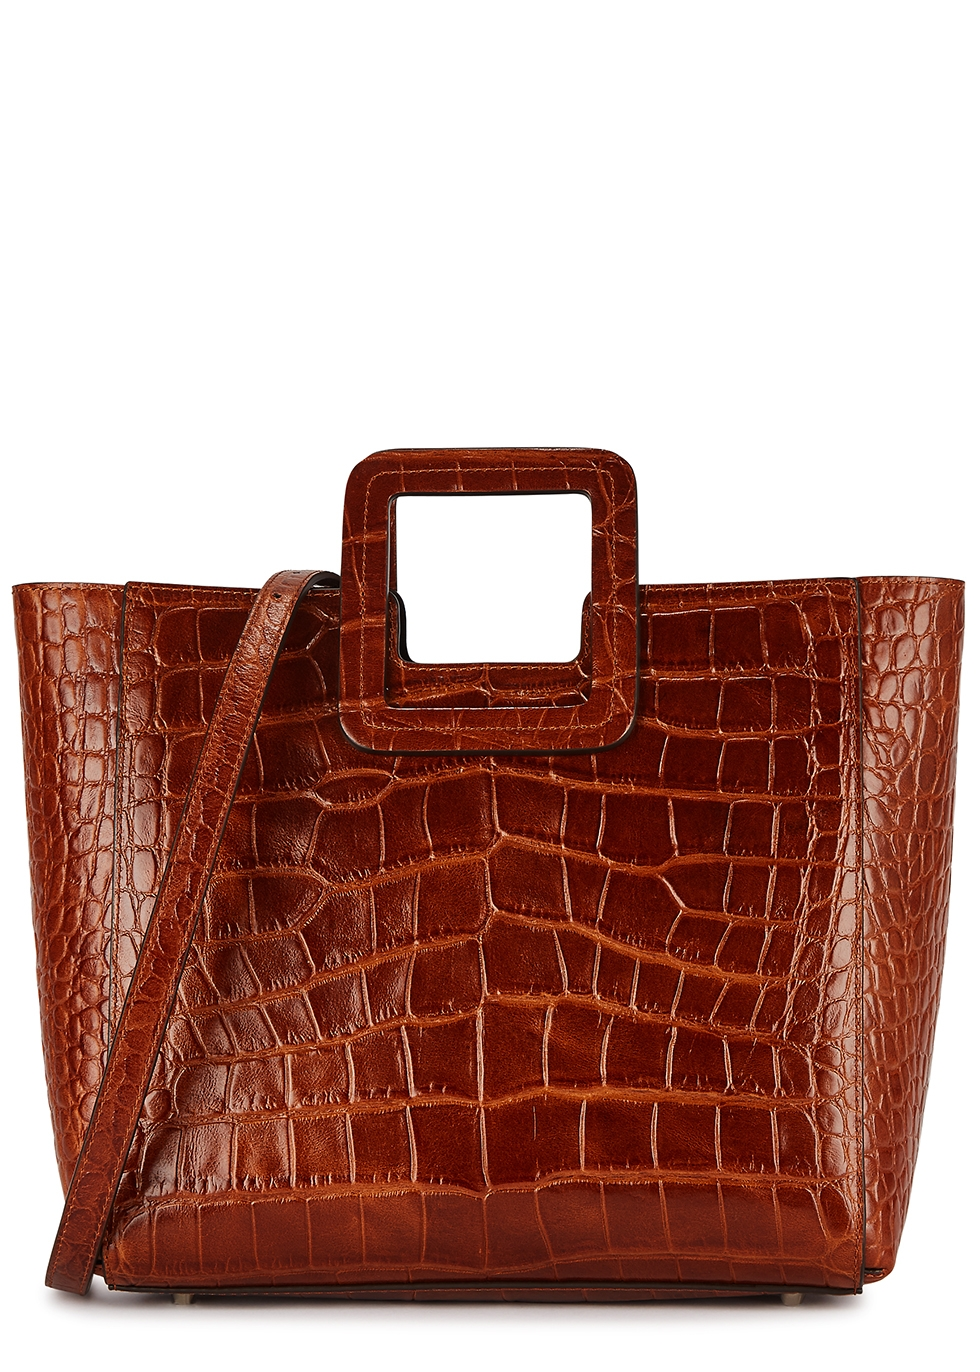 Shirley brown crocodile-effect leather tote